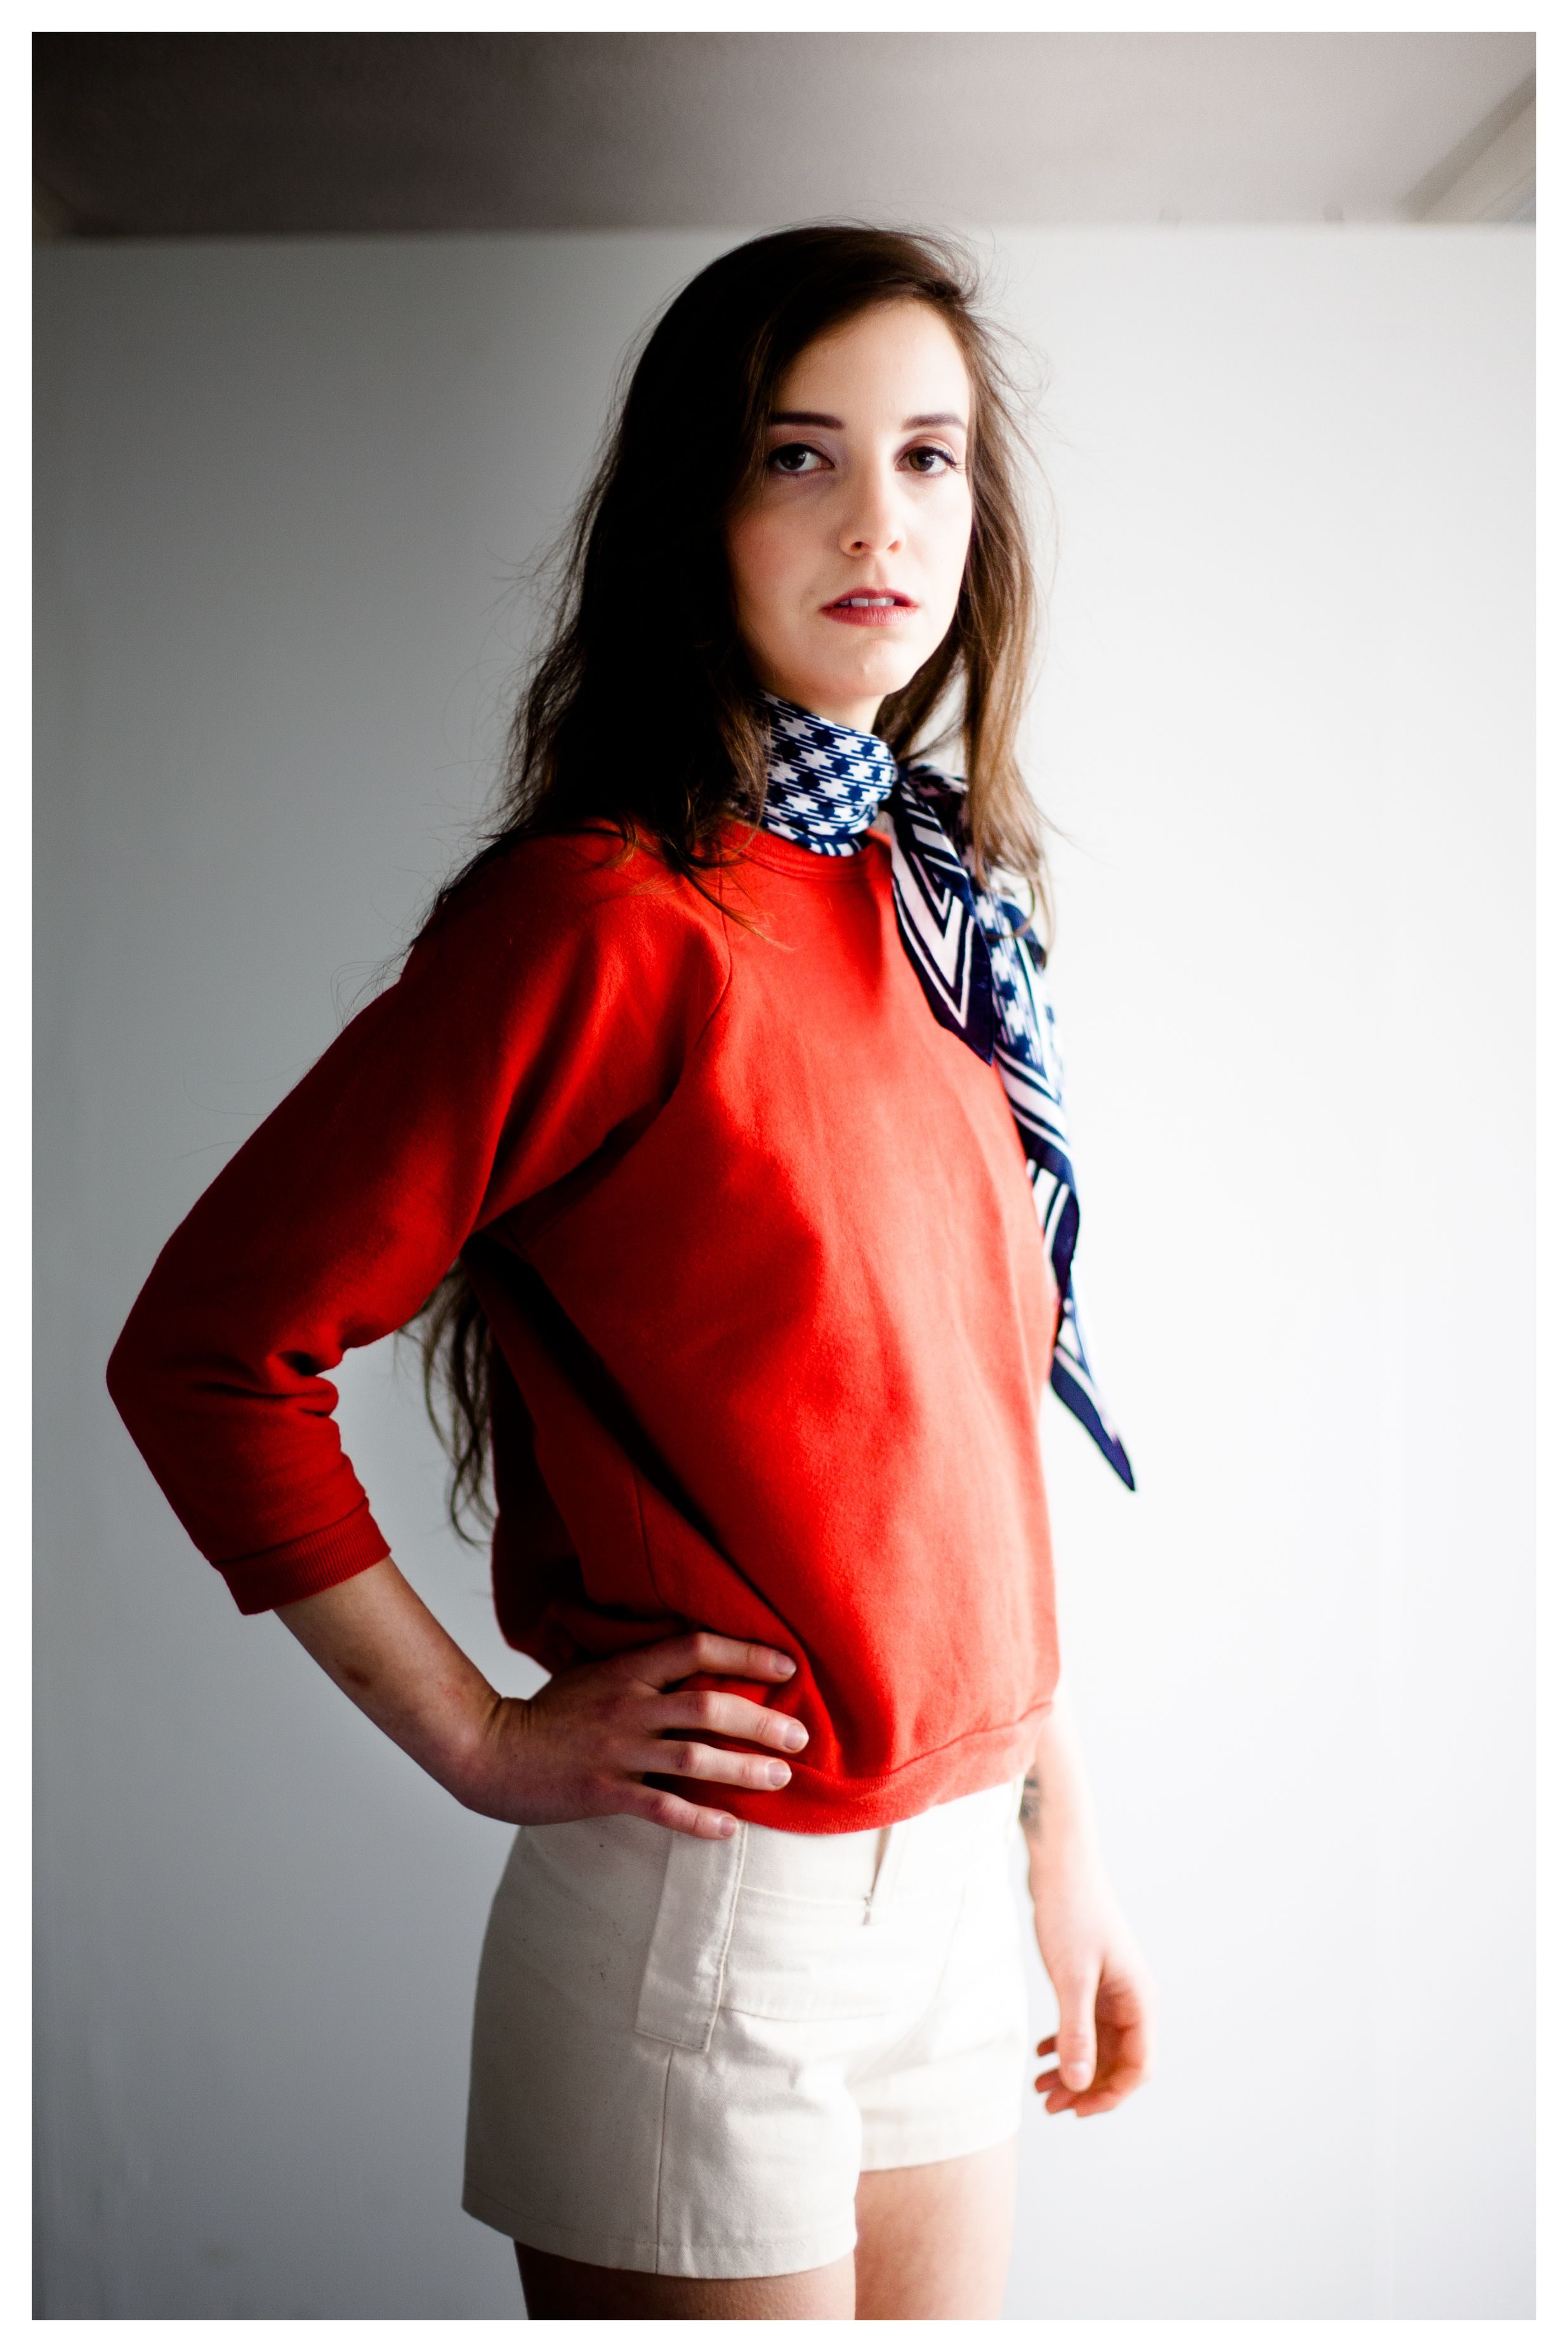 Shorts Design LINA. Photos Magic Hour Video. Model Barbora Gajdošová.  Make Up Karolina Pacholarz.  Stylist LINA.